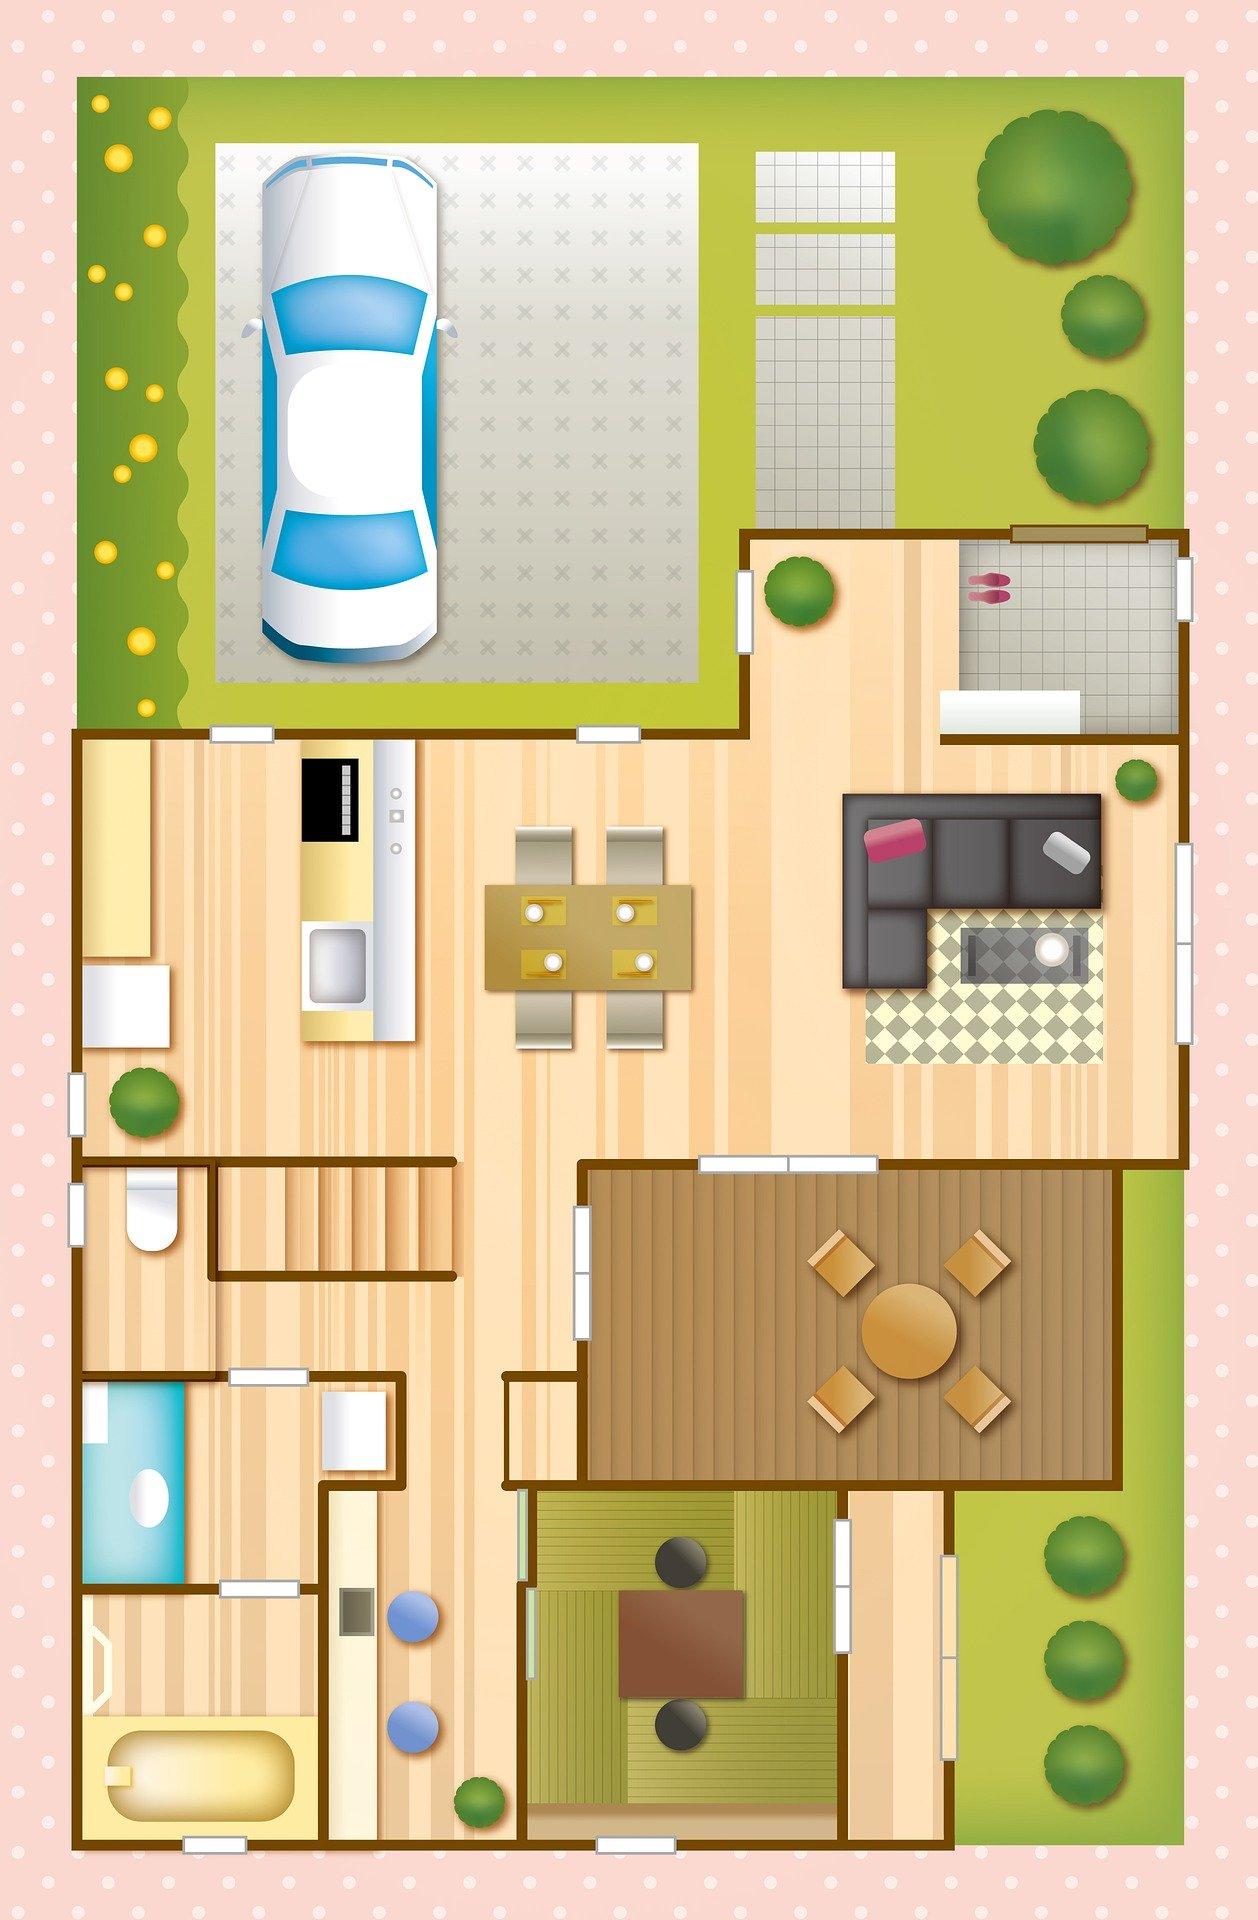 house-floorplan-4321812_1920